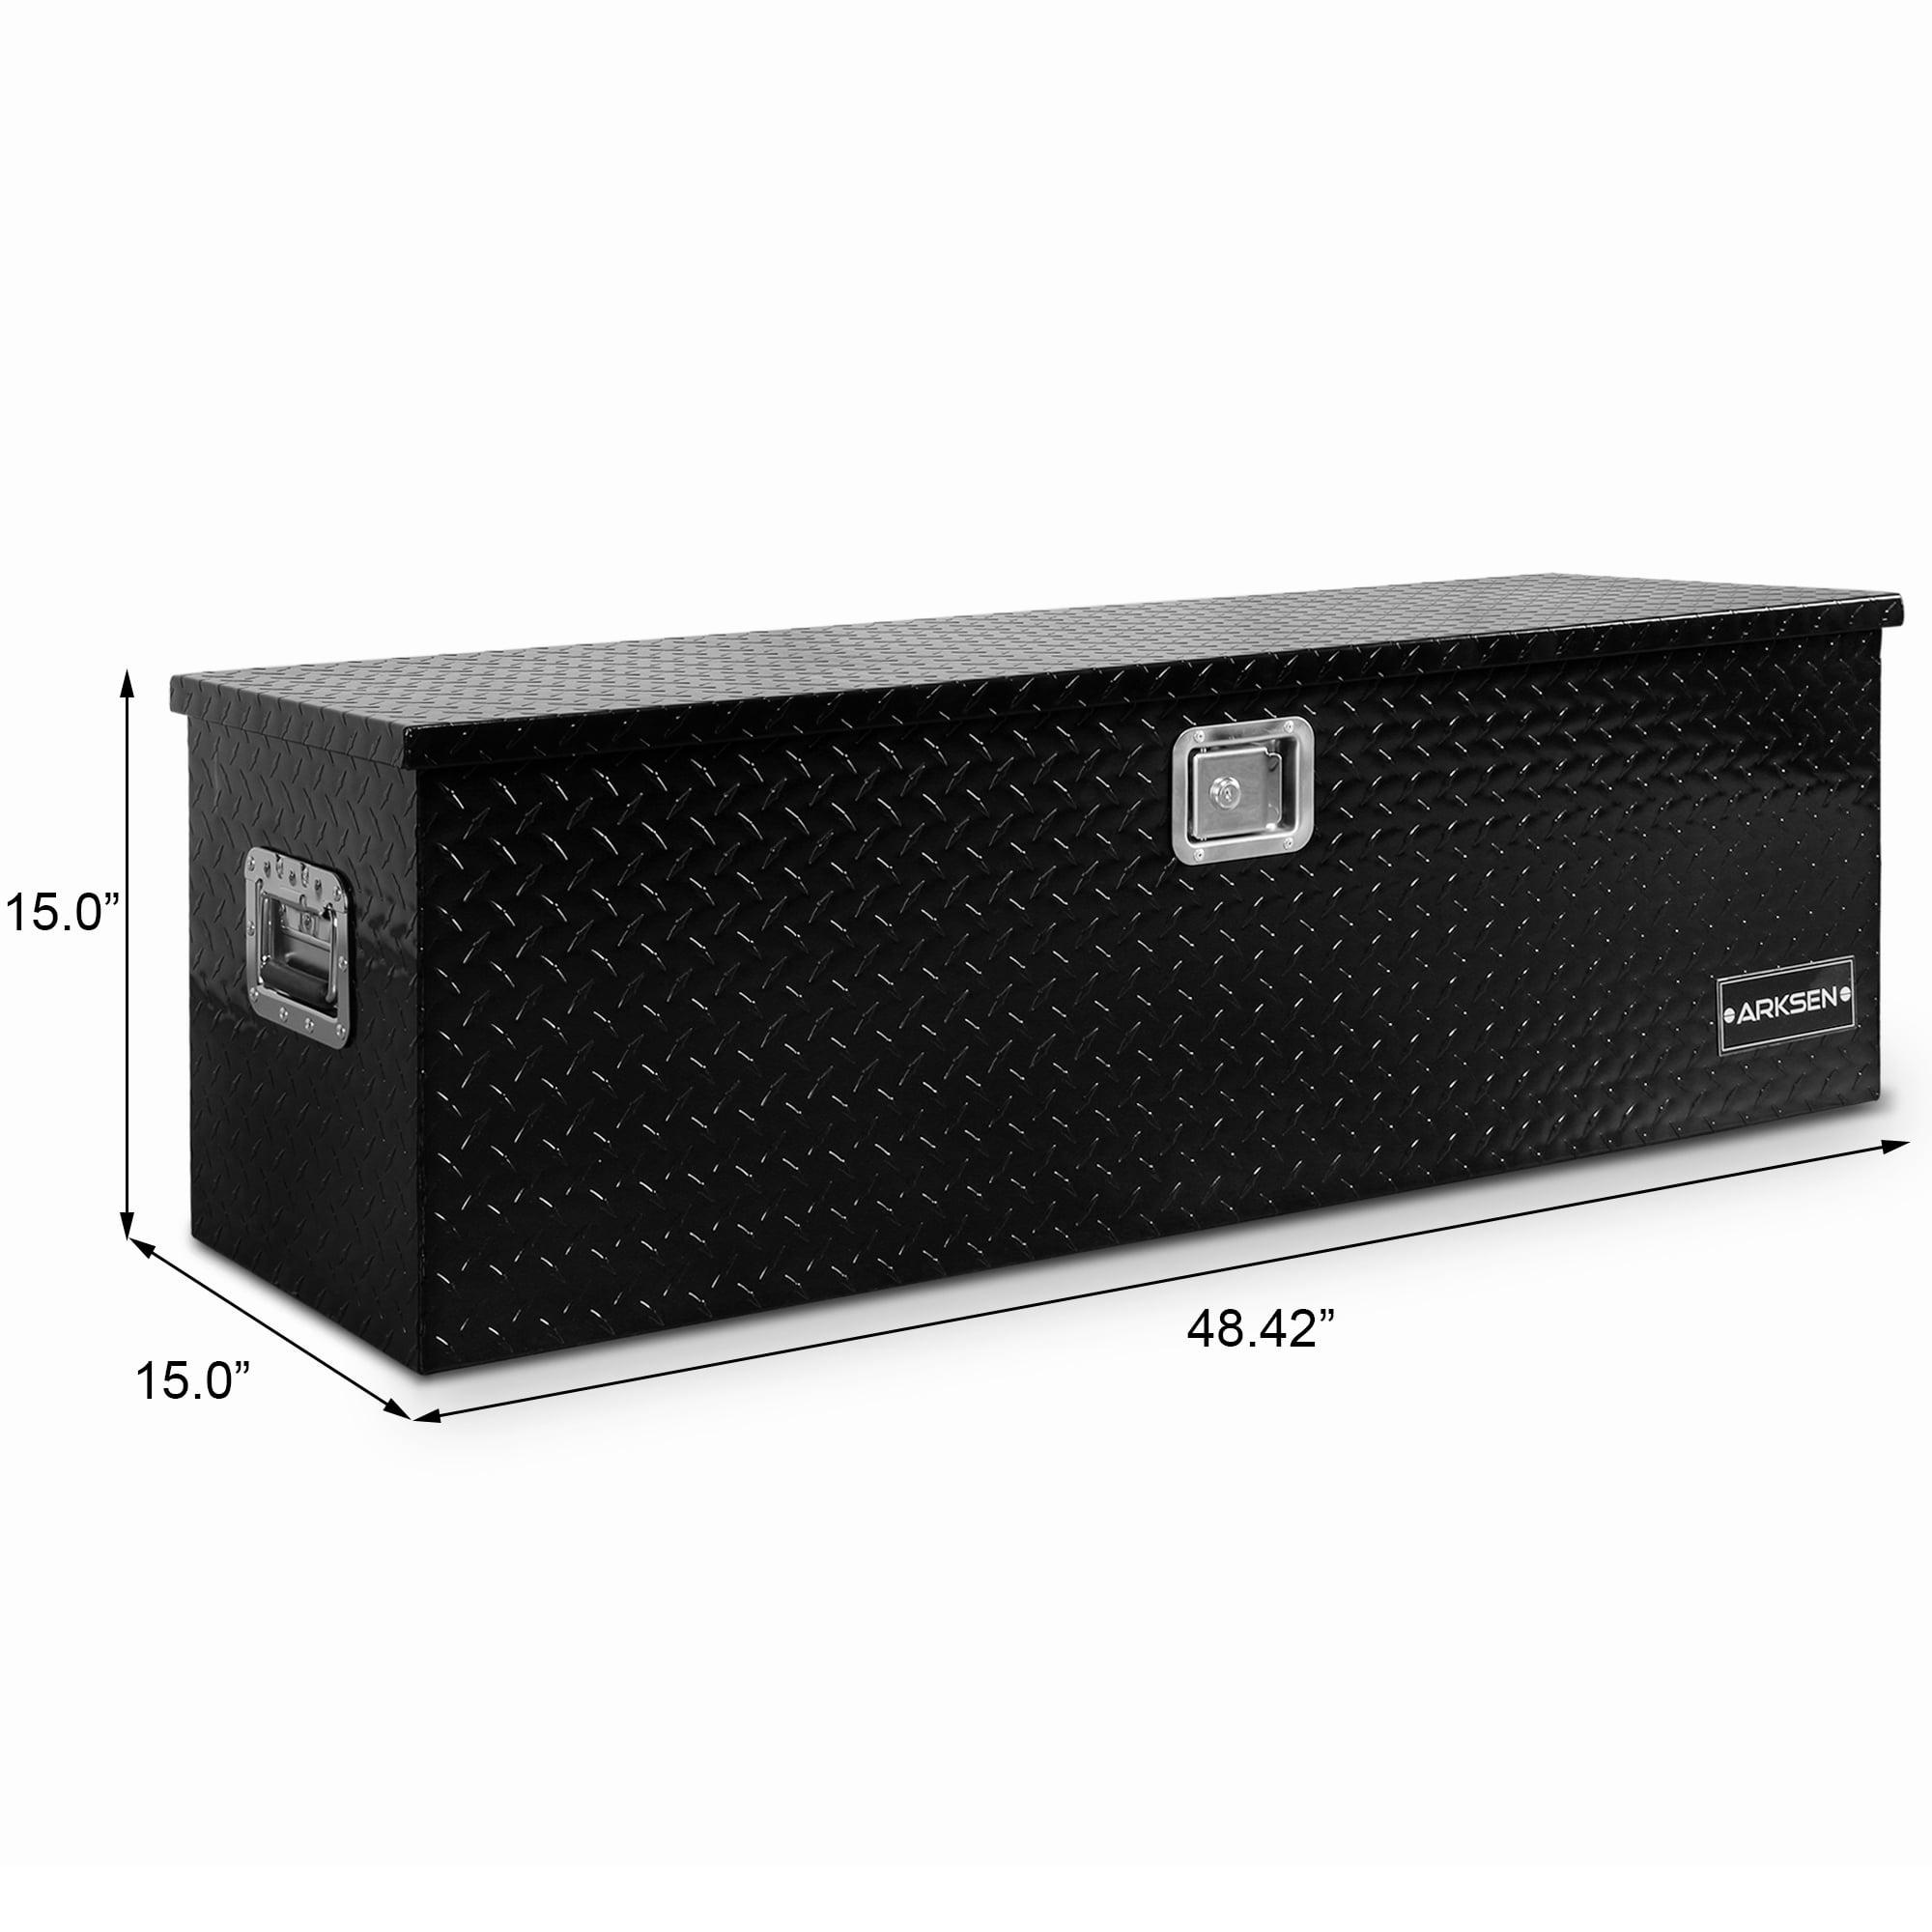 "Aluminum Truck Tool Box for Garage Pickup Trailer RV Storage 49/"" x 15/"" x 15/"""